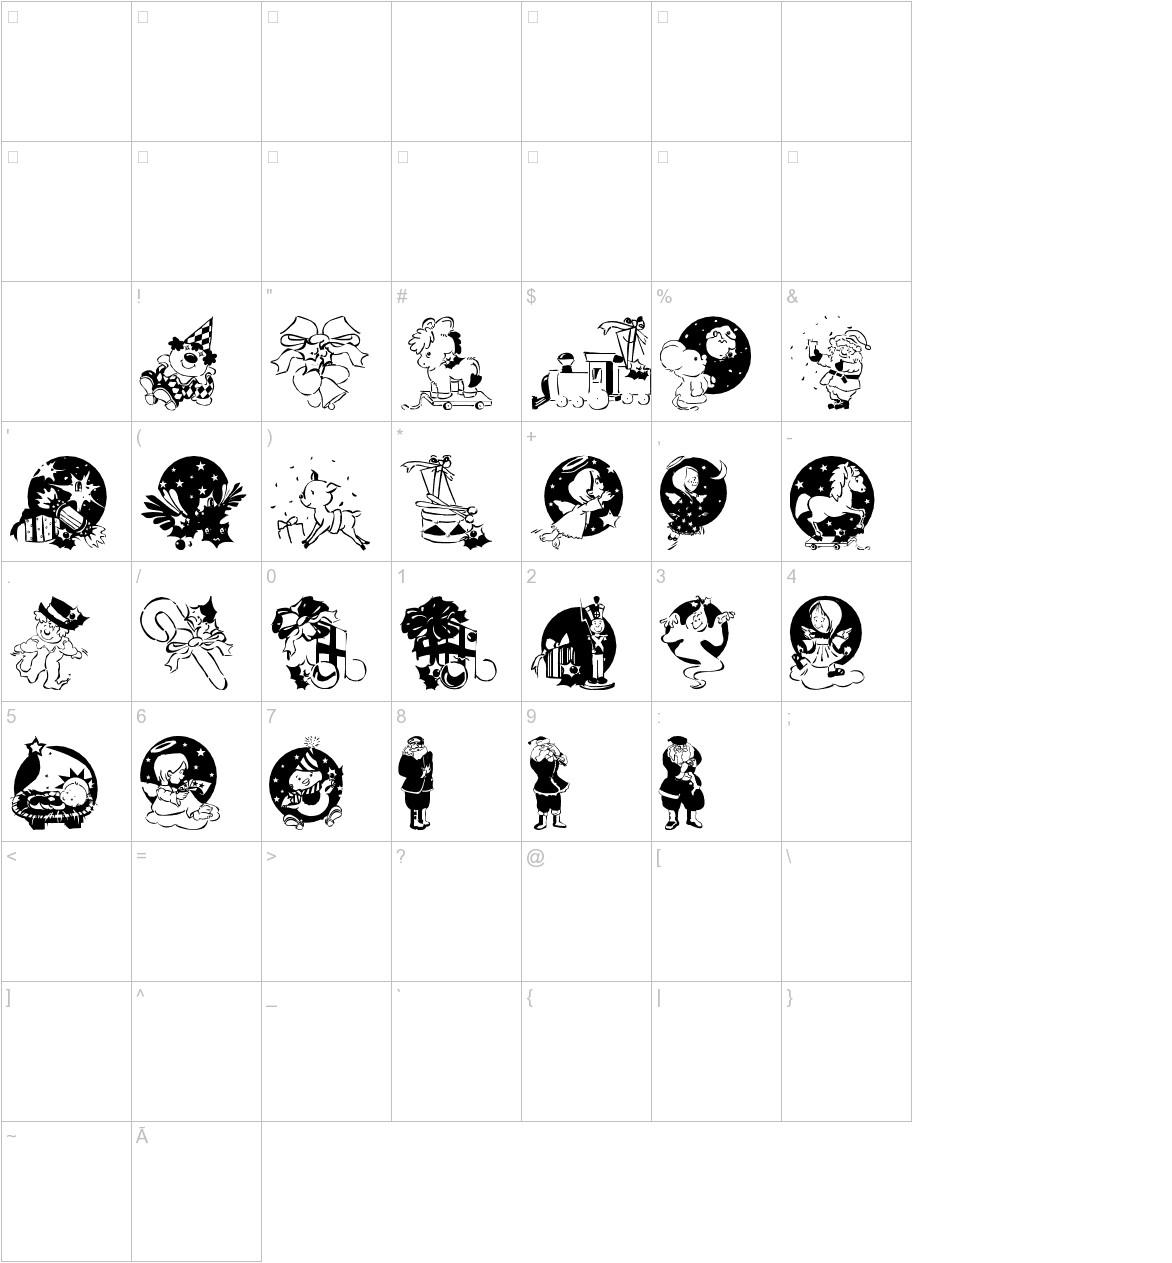 XmasPromotionsSymbols characters